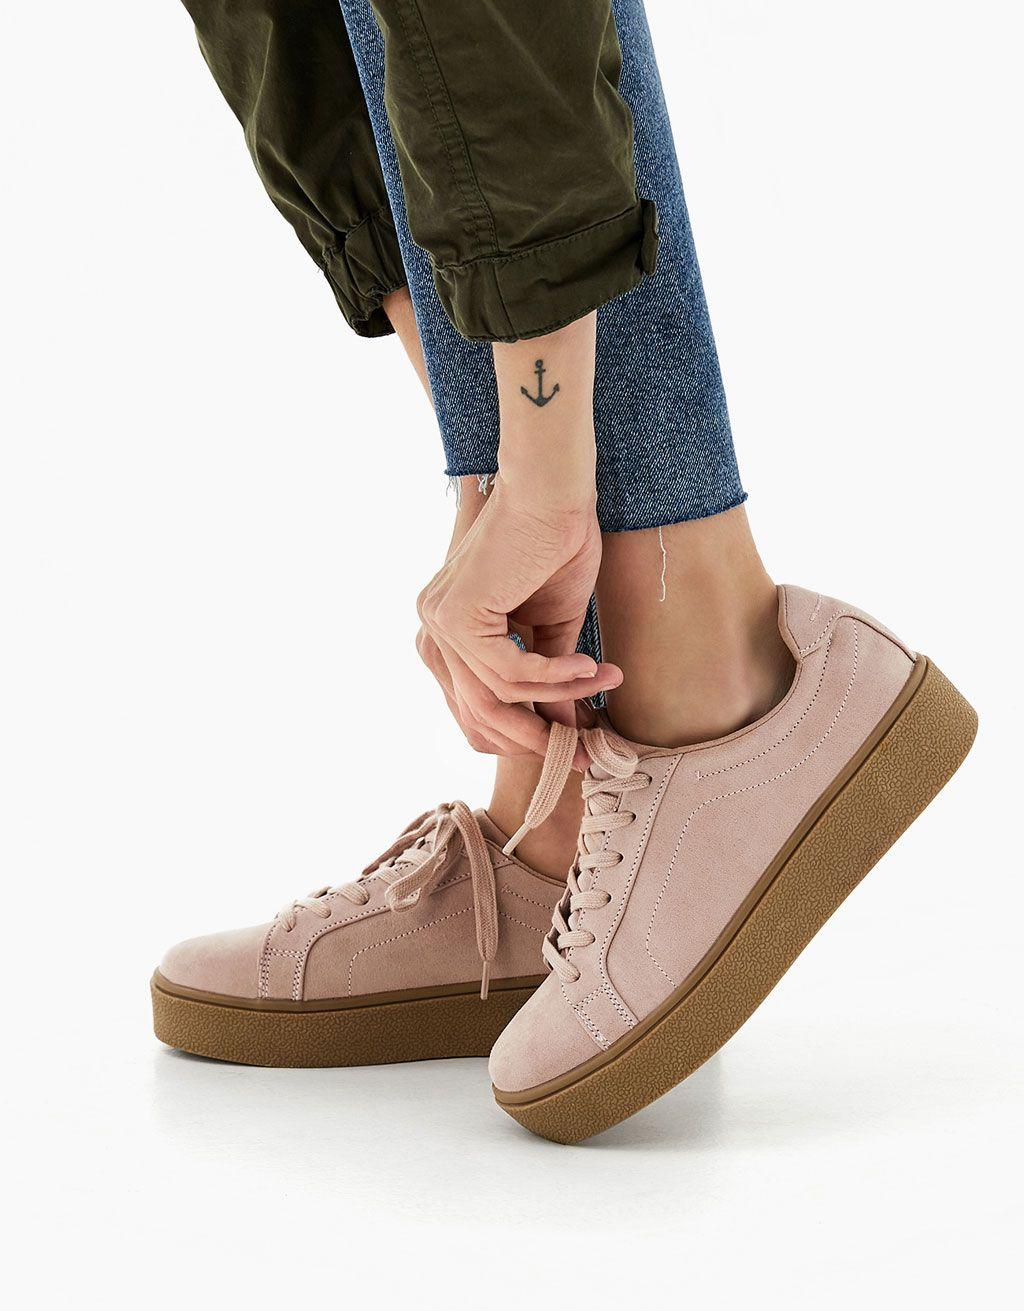 baskets plateforme mode - chaussures - bershka france | wishlist